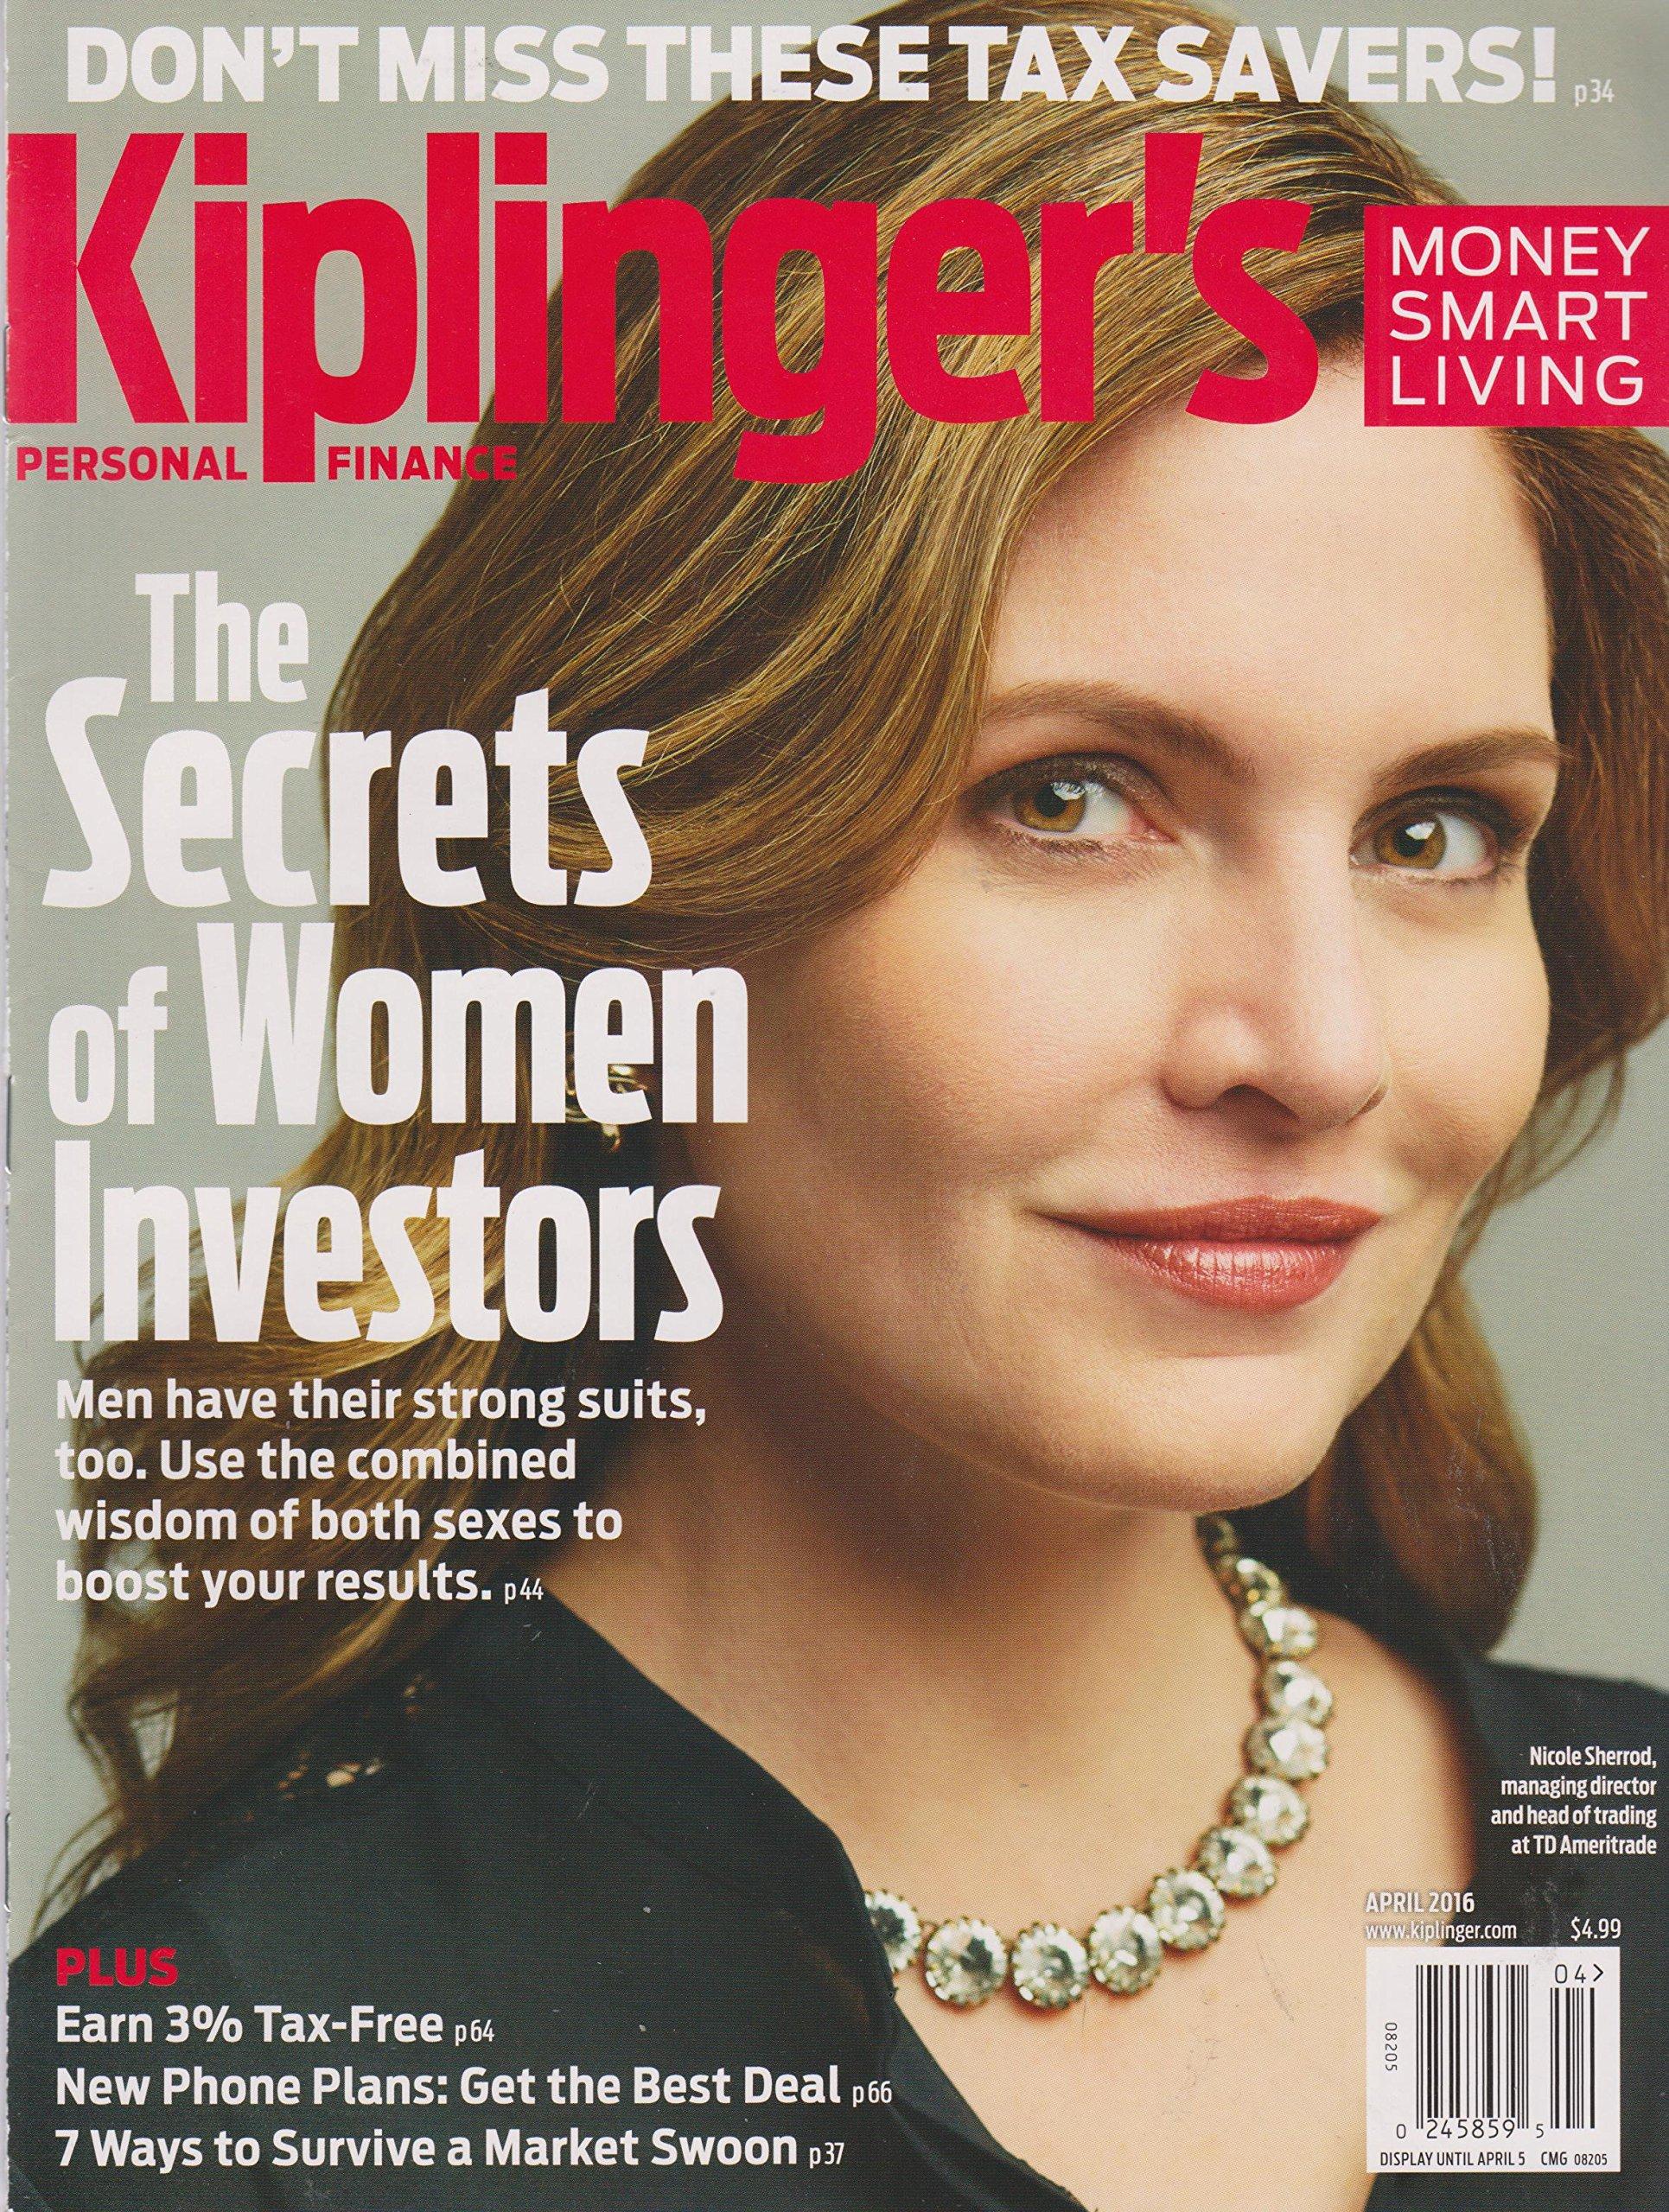 Read Online Kiplinger's April 2016 The Secrets of Women Investors pdf epub